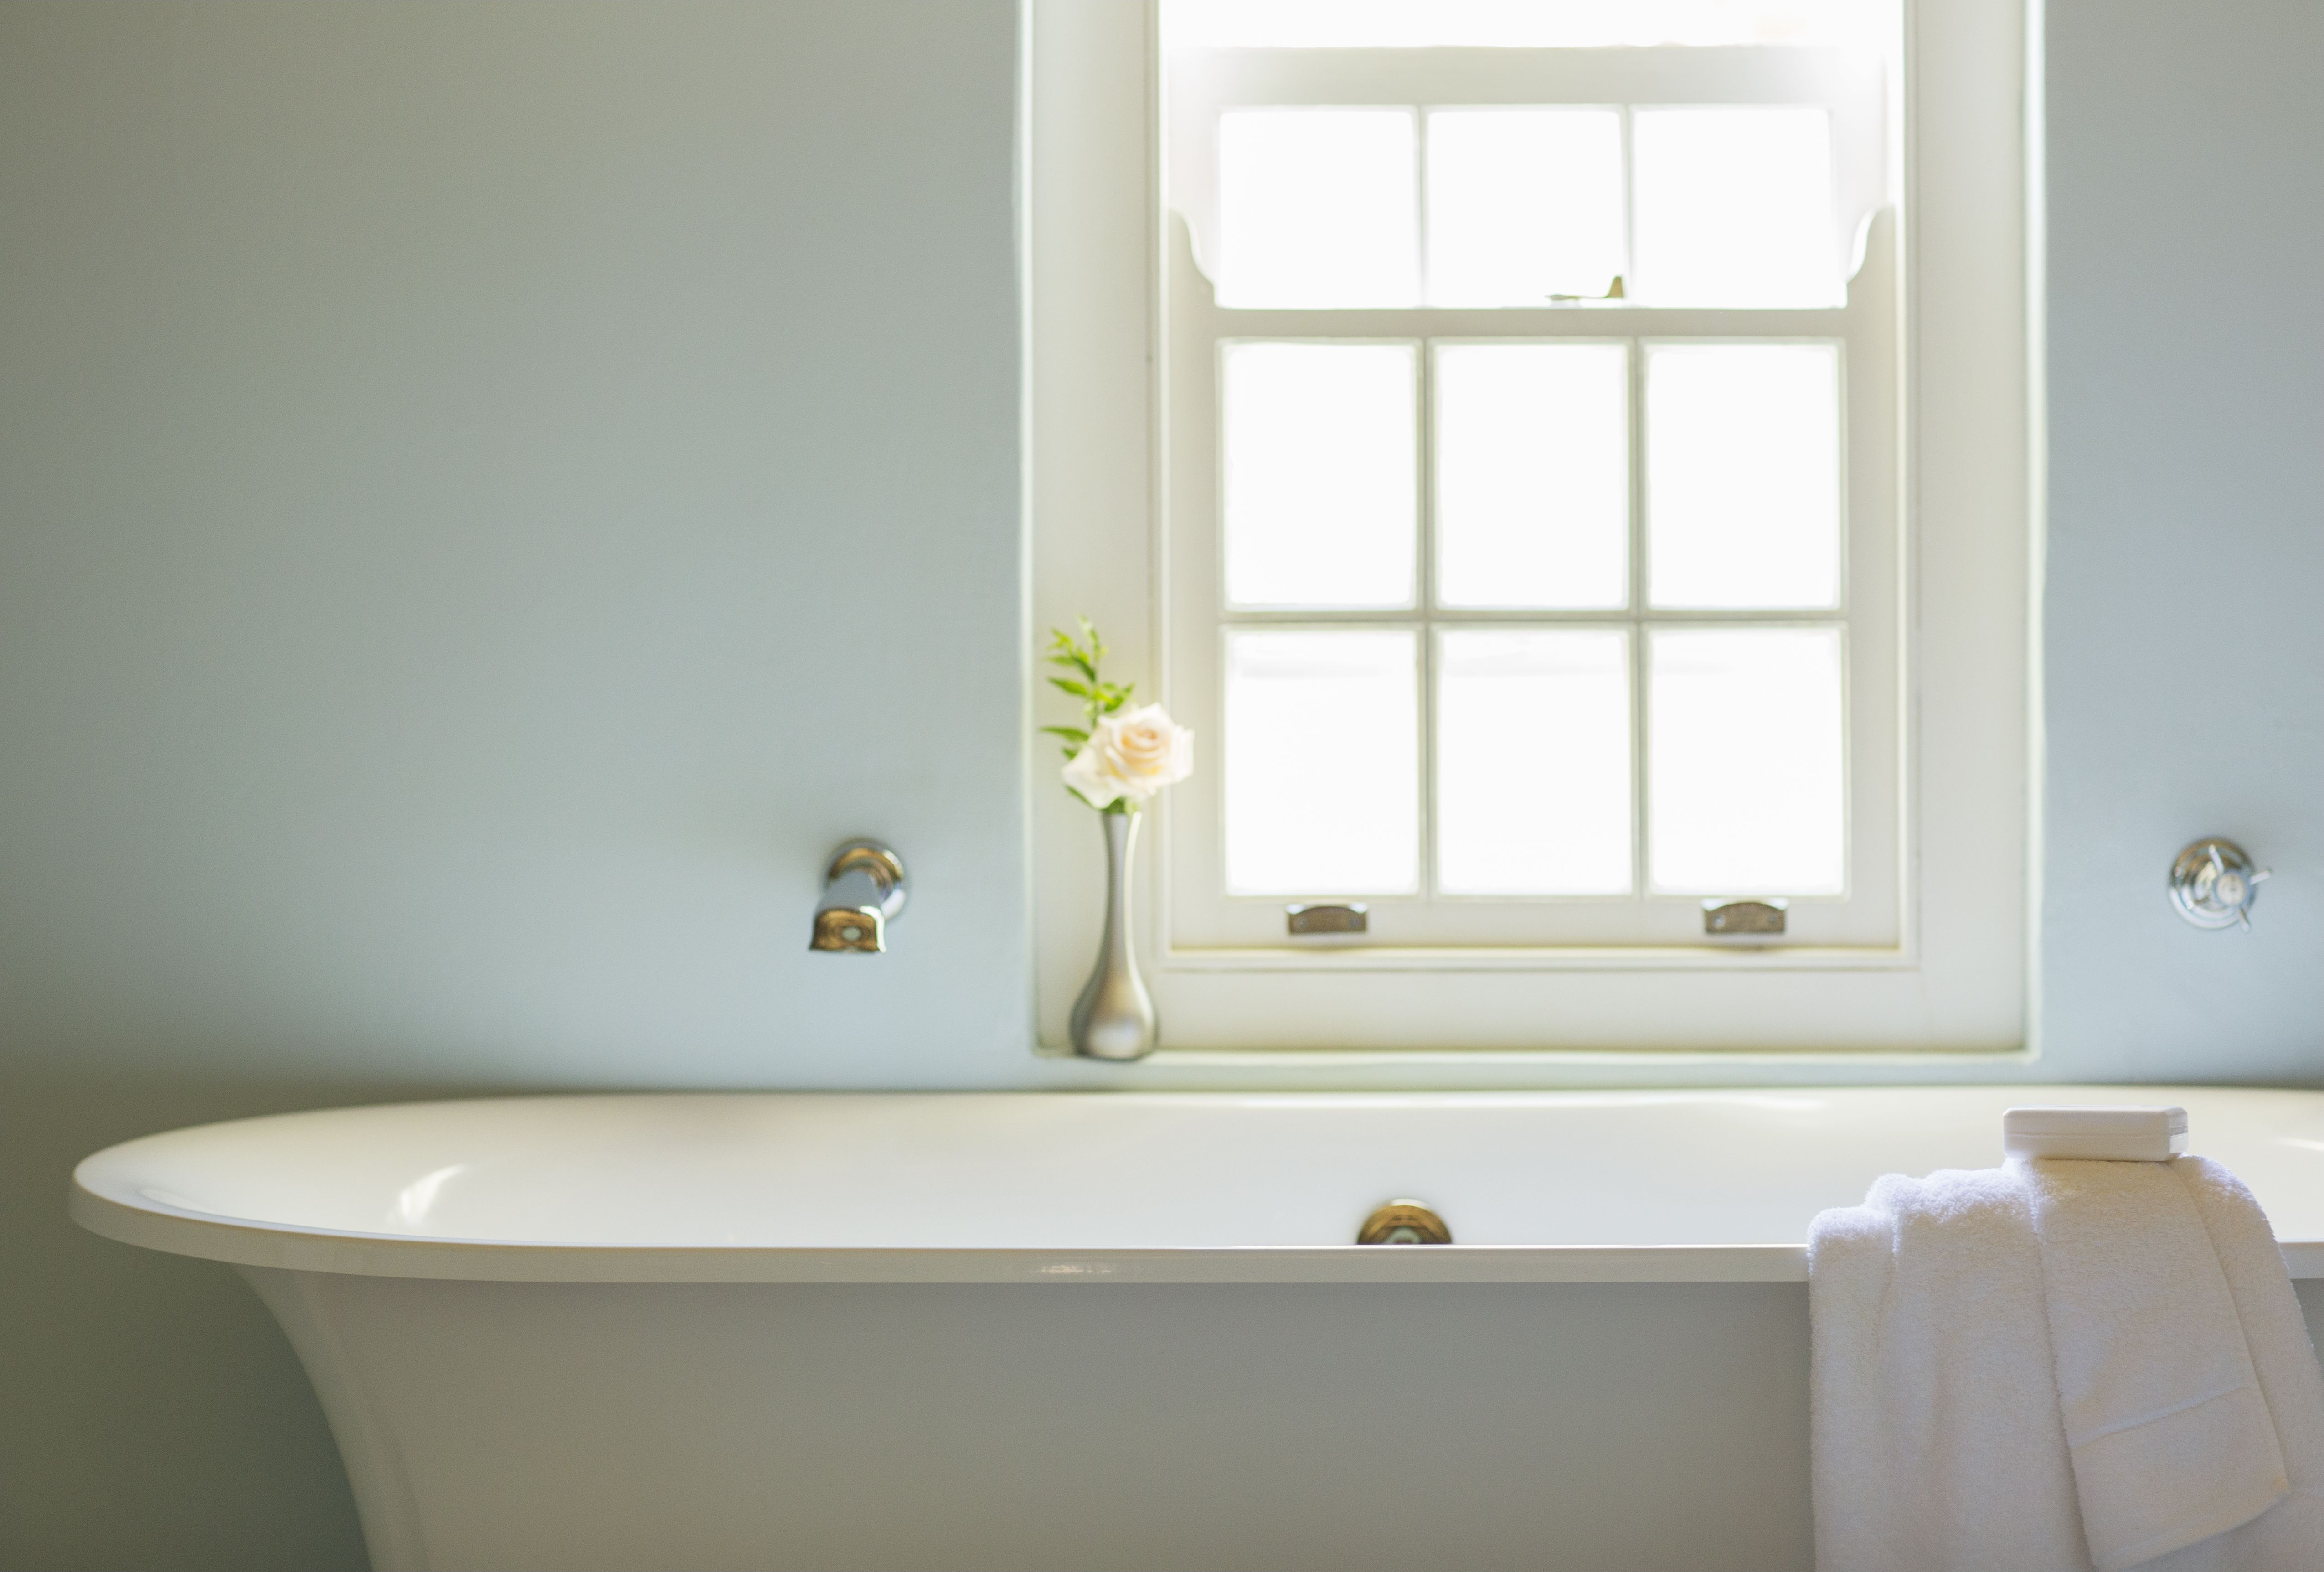 soaking tub below window in luxury bathroom 494358425 5aa1e931c064710037061882